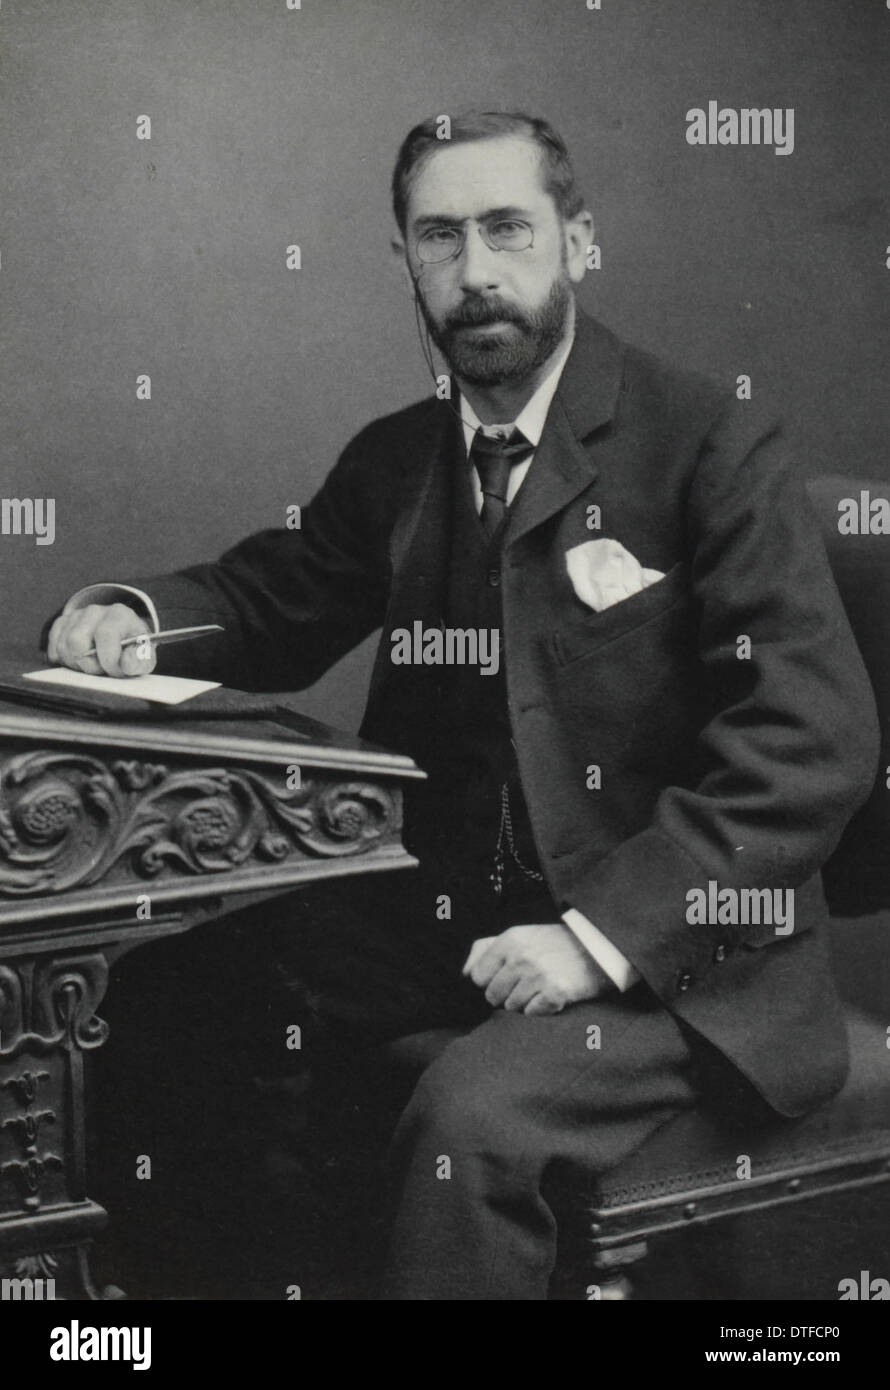 Sir William Abbott Herdman (1858-1924) - Stock Image